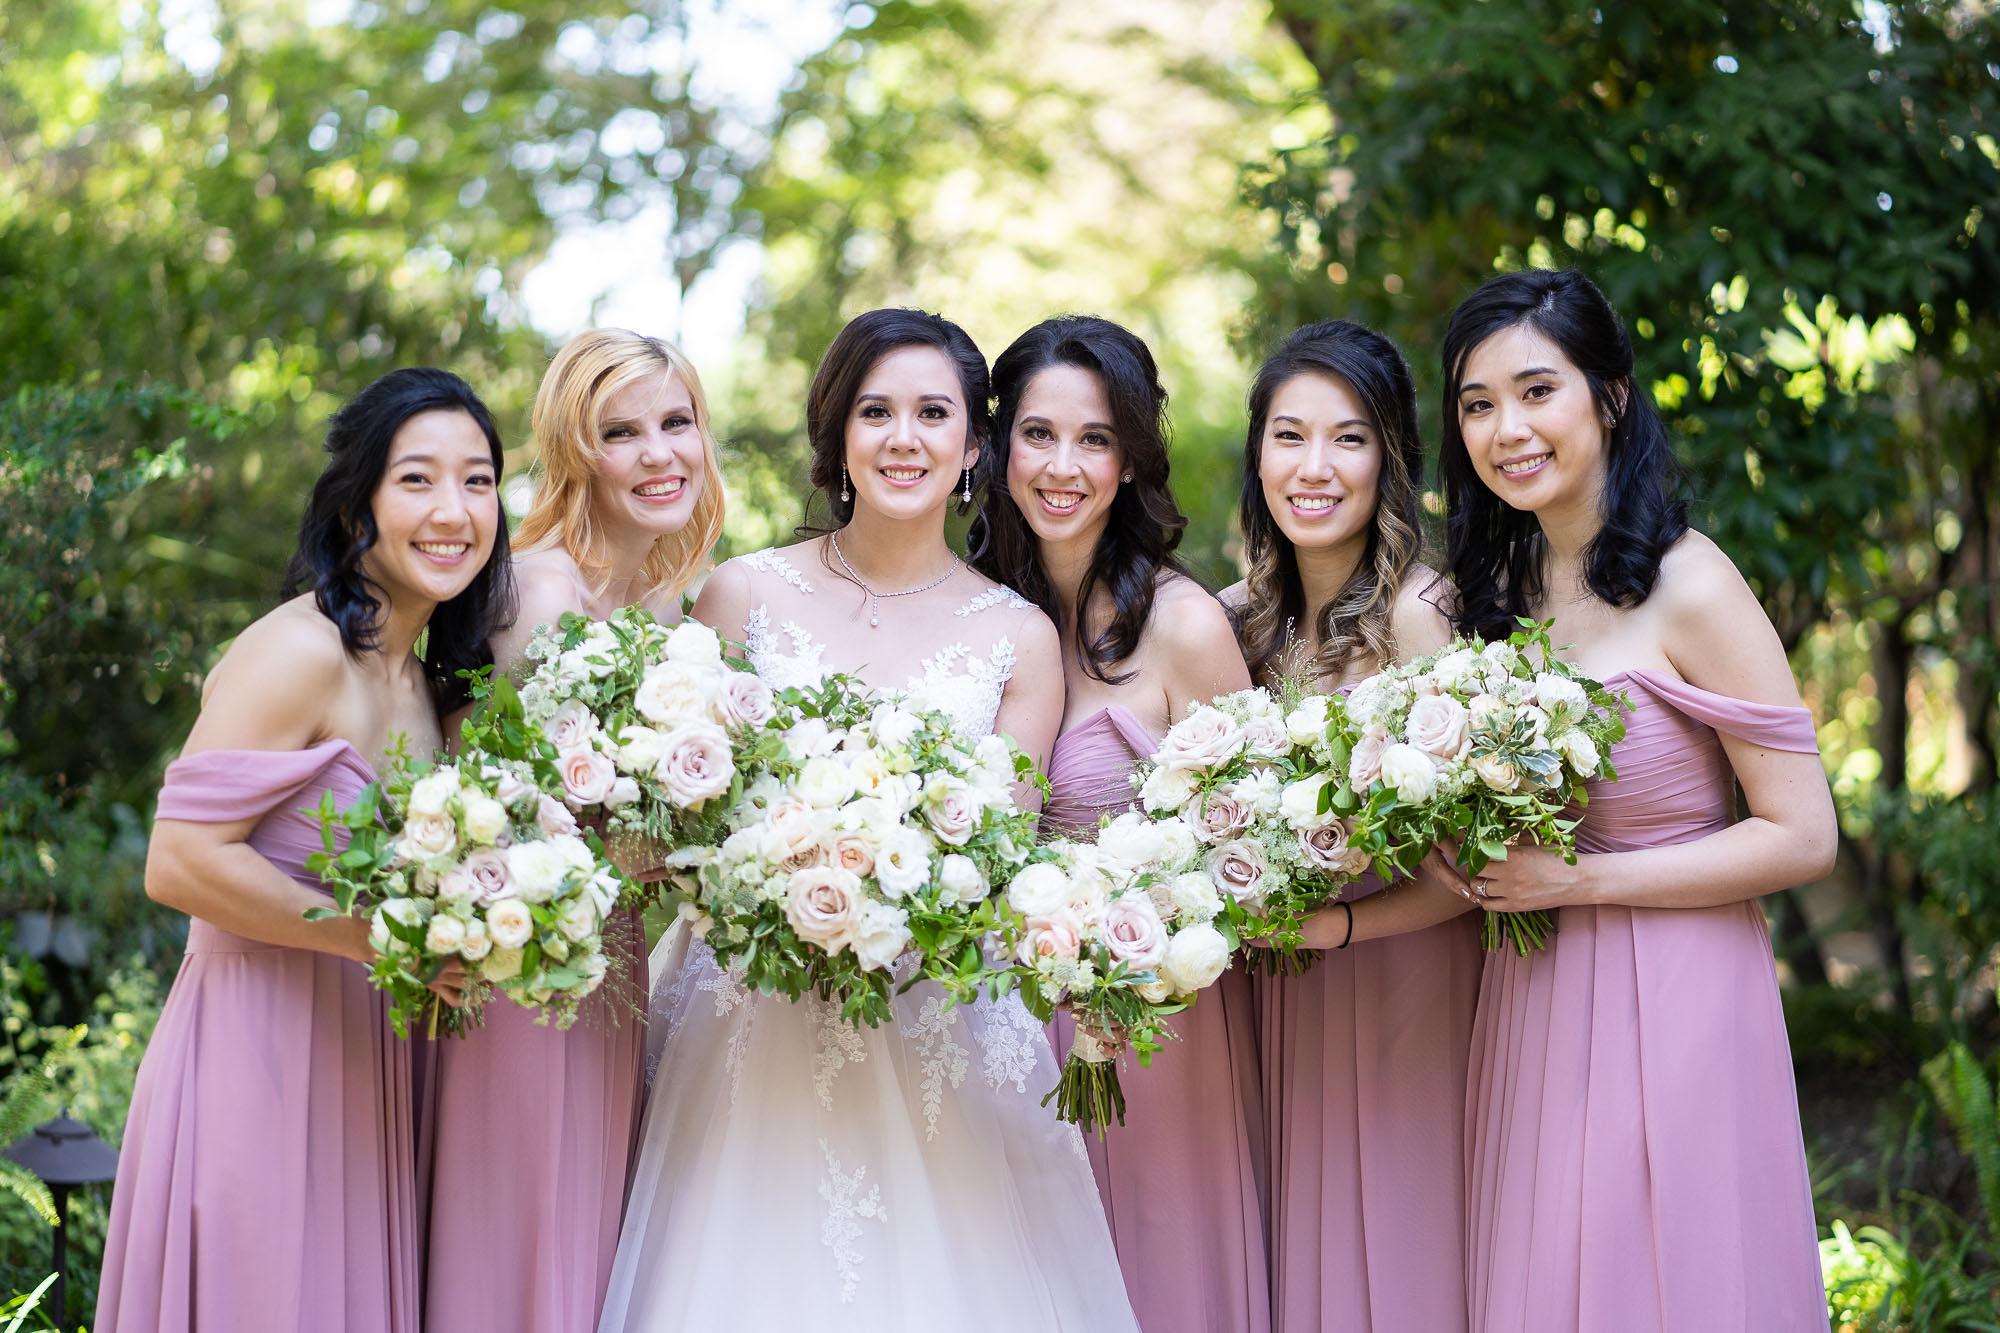 Resized-S&S-WeddingHighlights-15.jpg